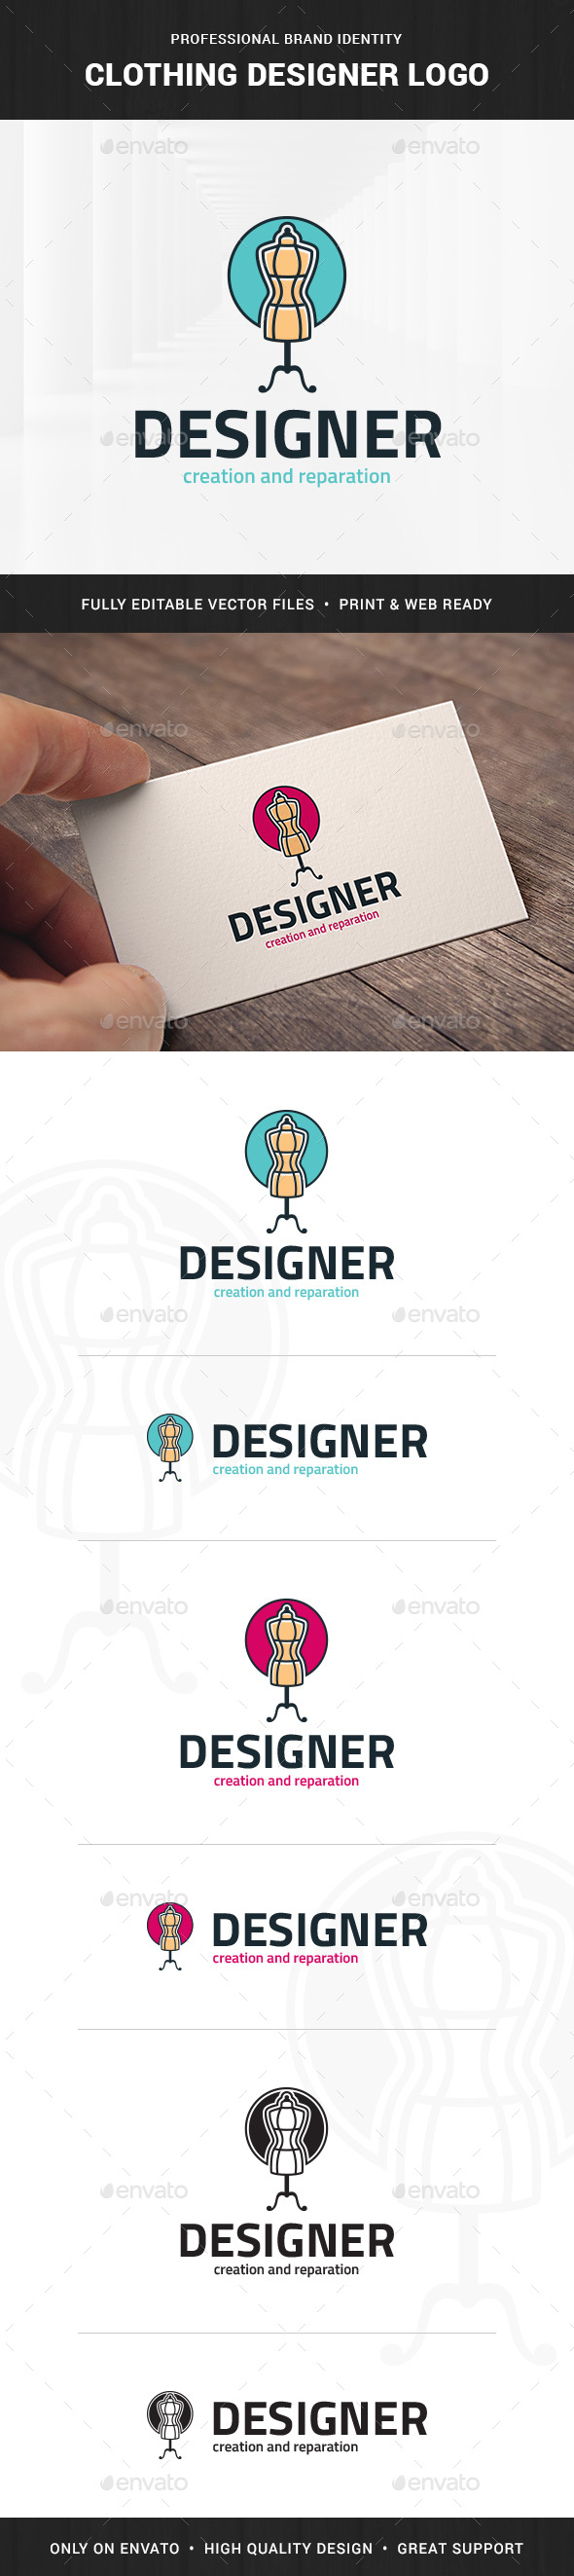 Clothing Designer Logo Template